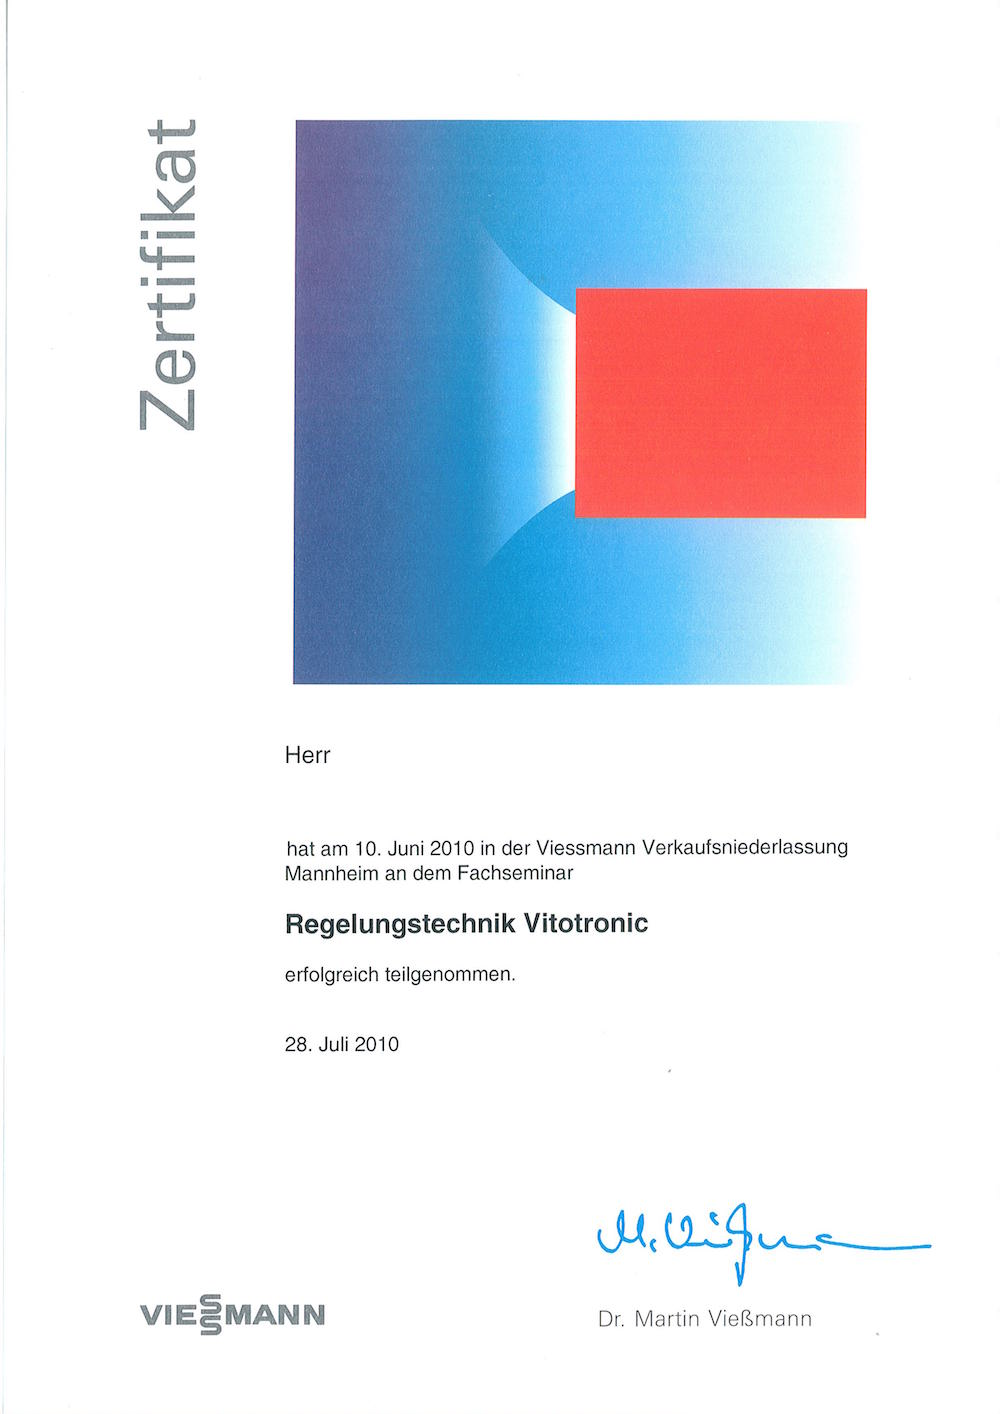 Regelungstechnik Vitotronic